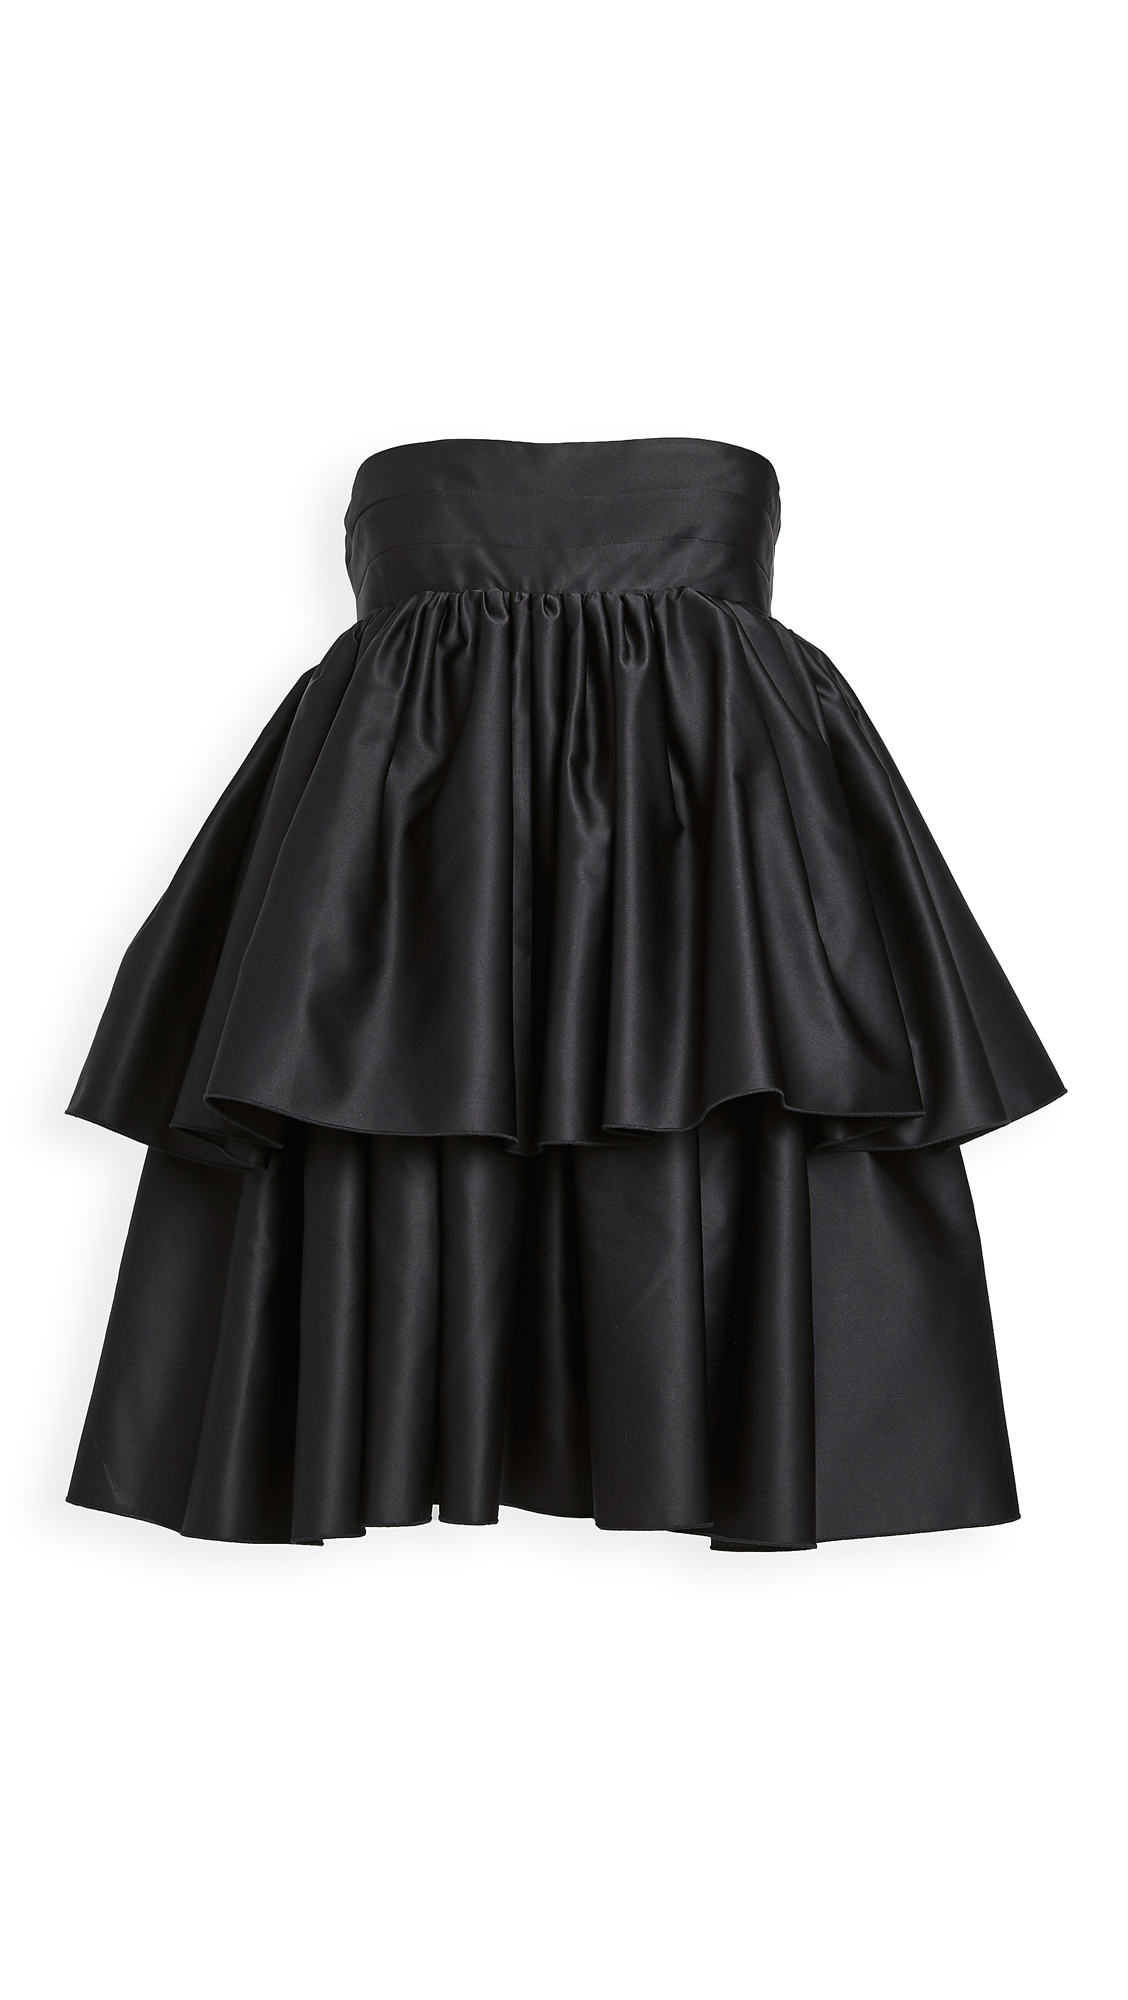 ROTATE Carmina Dress - 30% Off Sale